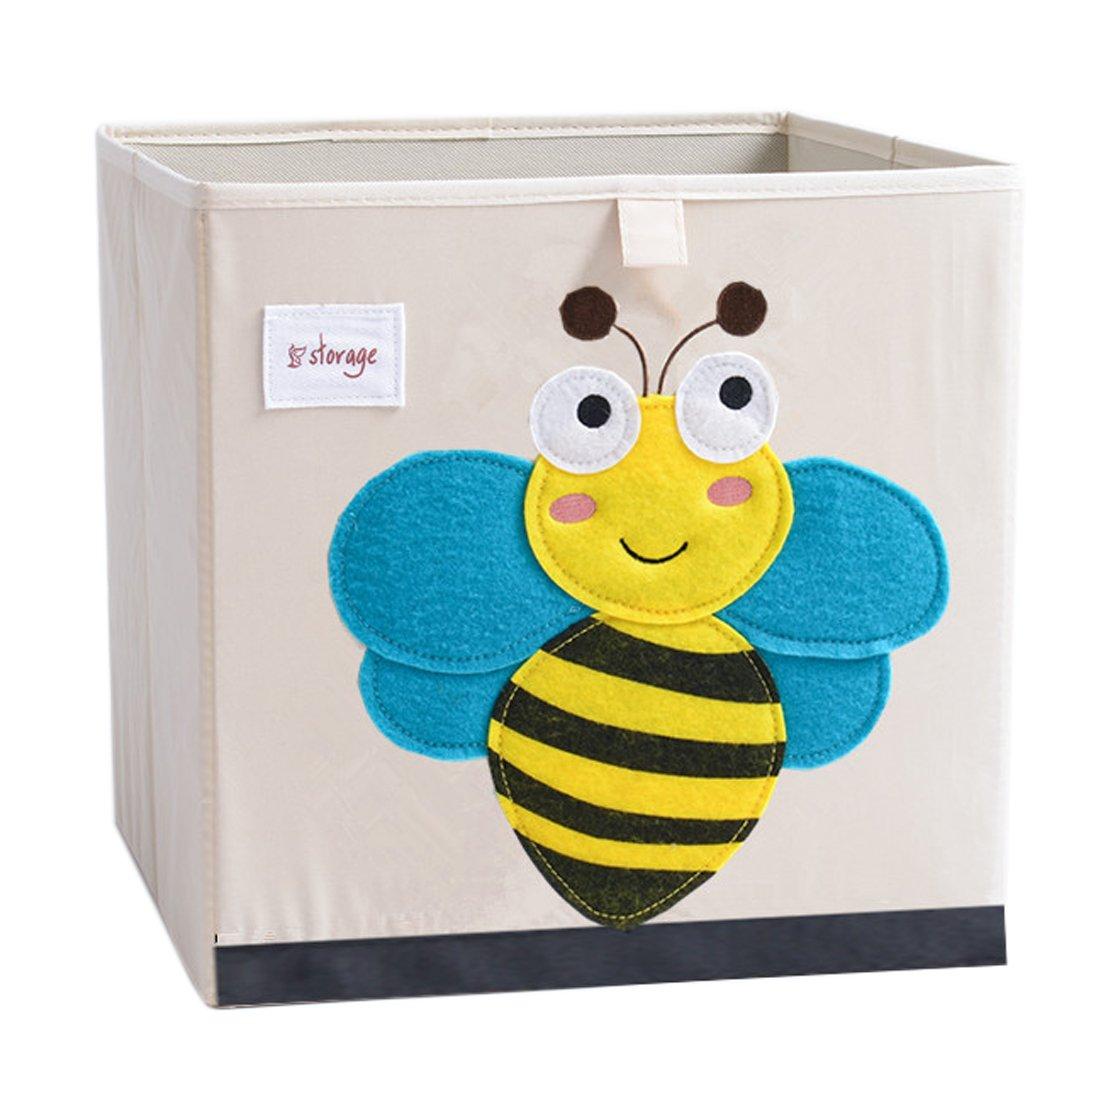 DODYMPS Foldable Animal Canvas Storage Toy Box/Bin/Cube/Chest/Basket/Organizer for Kids, 13 inch (Bee) by DODYMPS